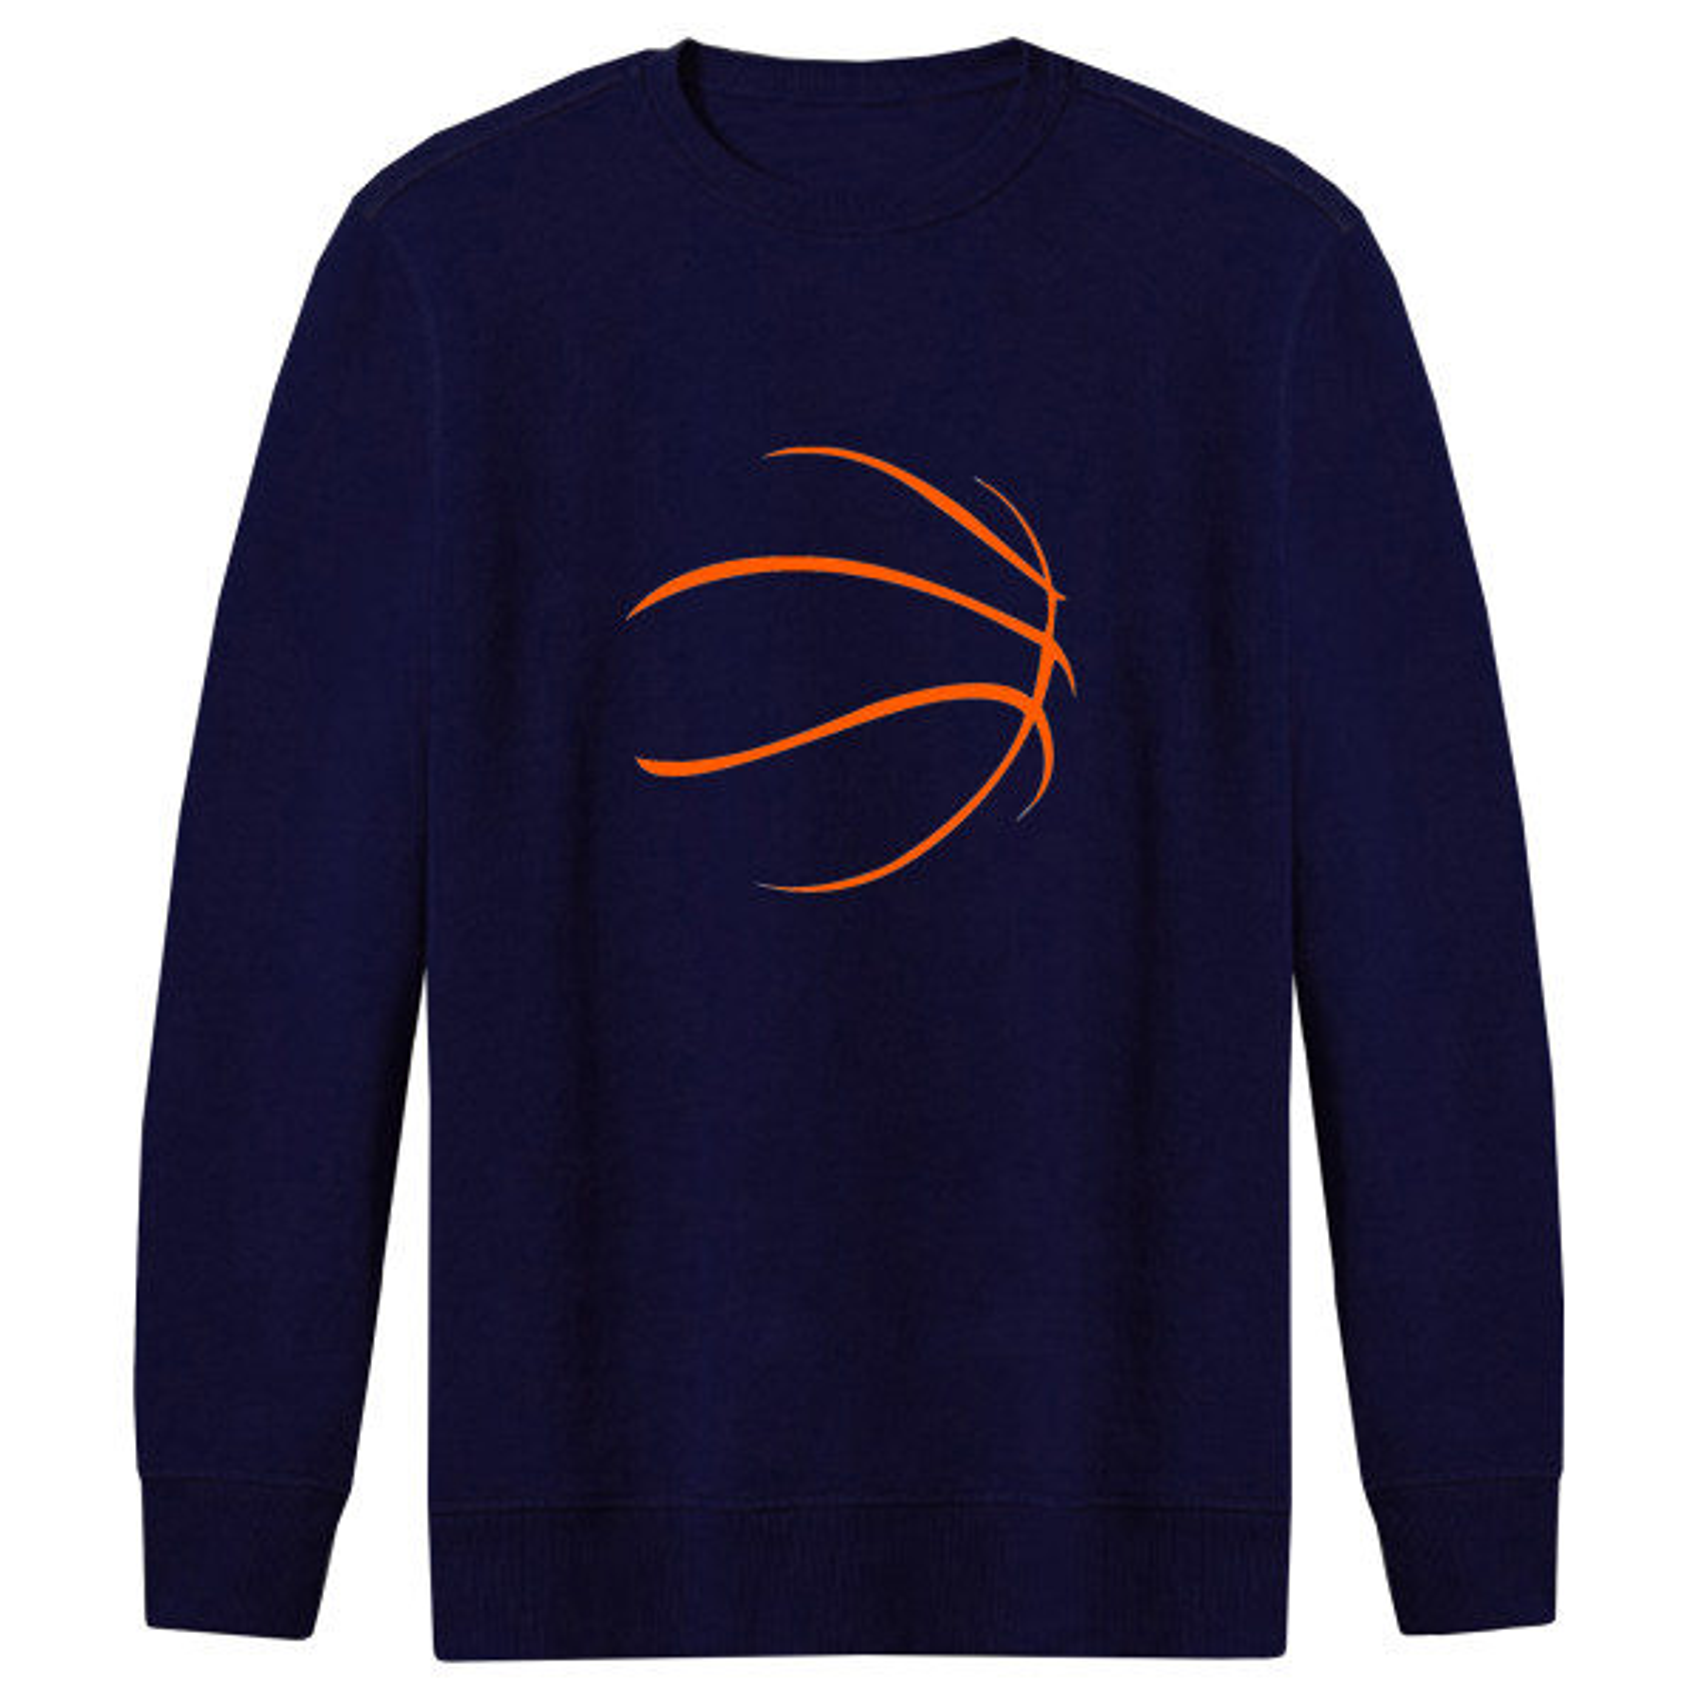 سویشرت مردانه طرح توپ بسکتبال کد FN270 رنگ سرمه ای